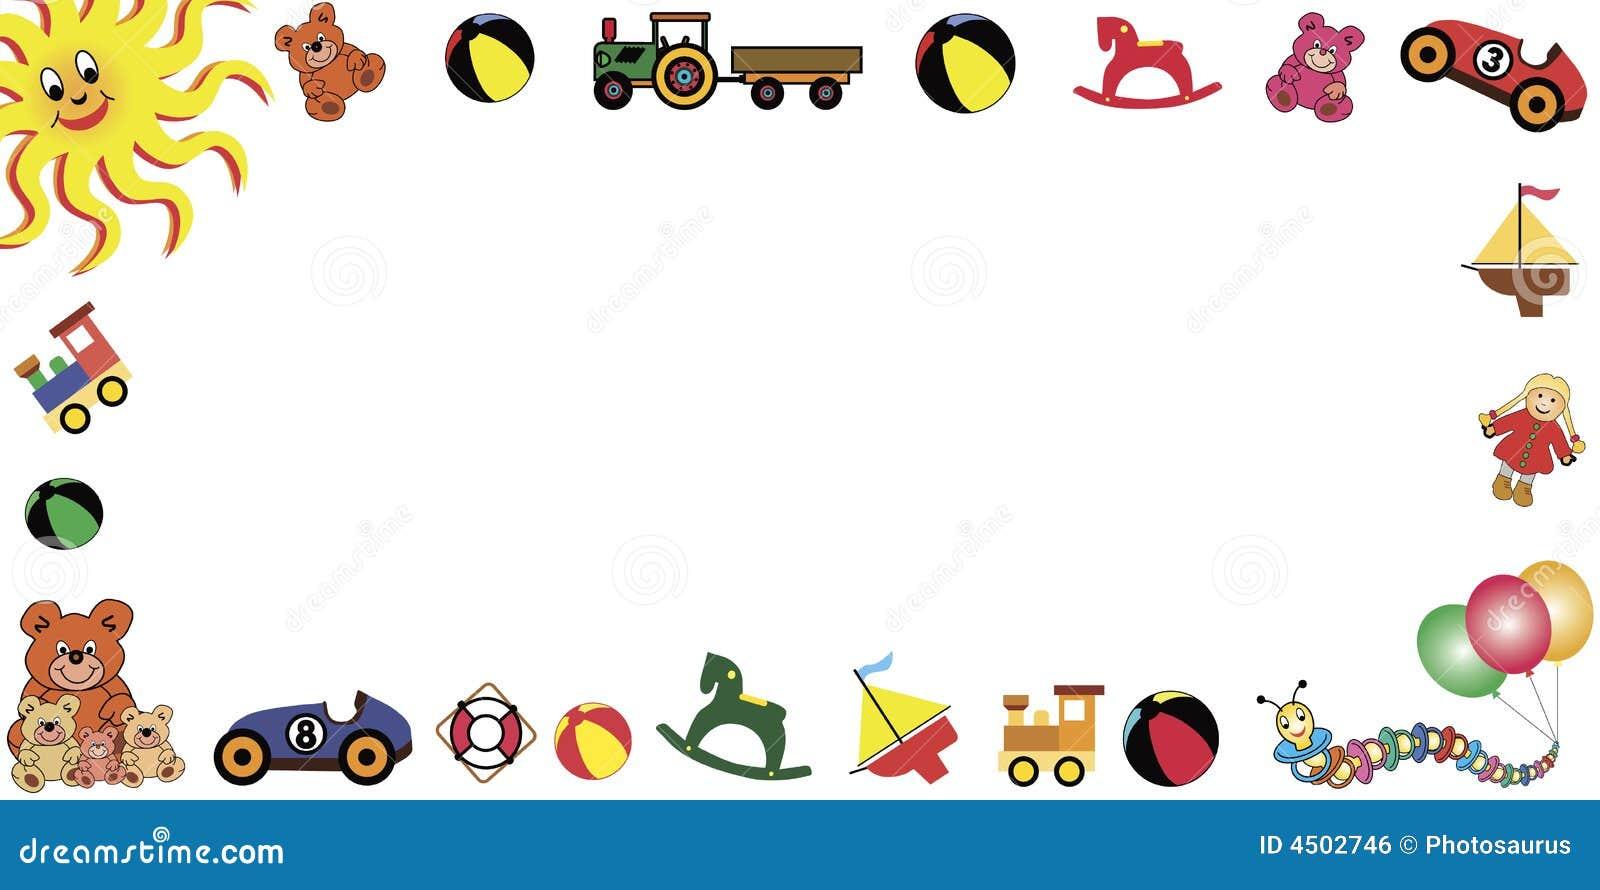 Toys frame horizontal stock vector. Illustration of carnival - 4502746